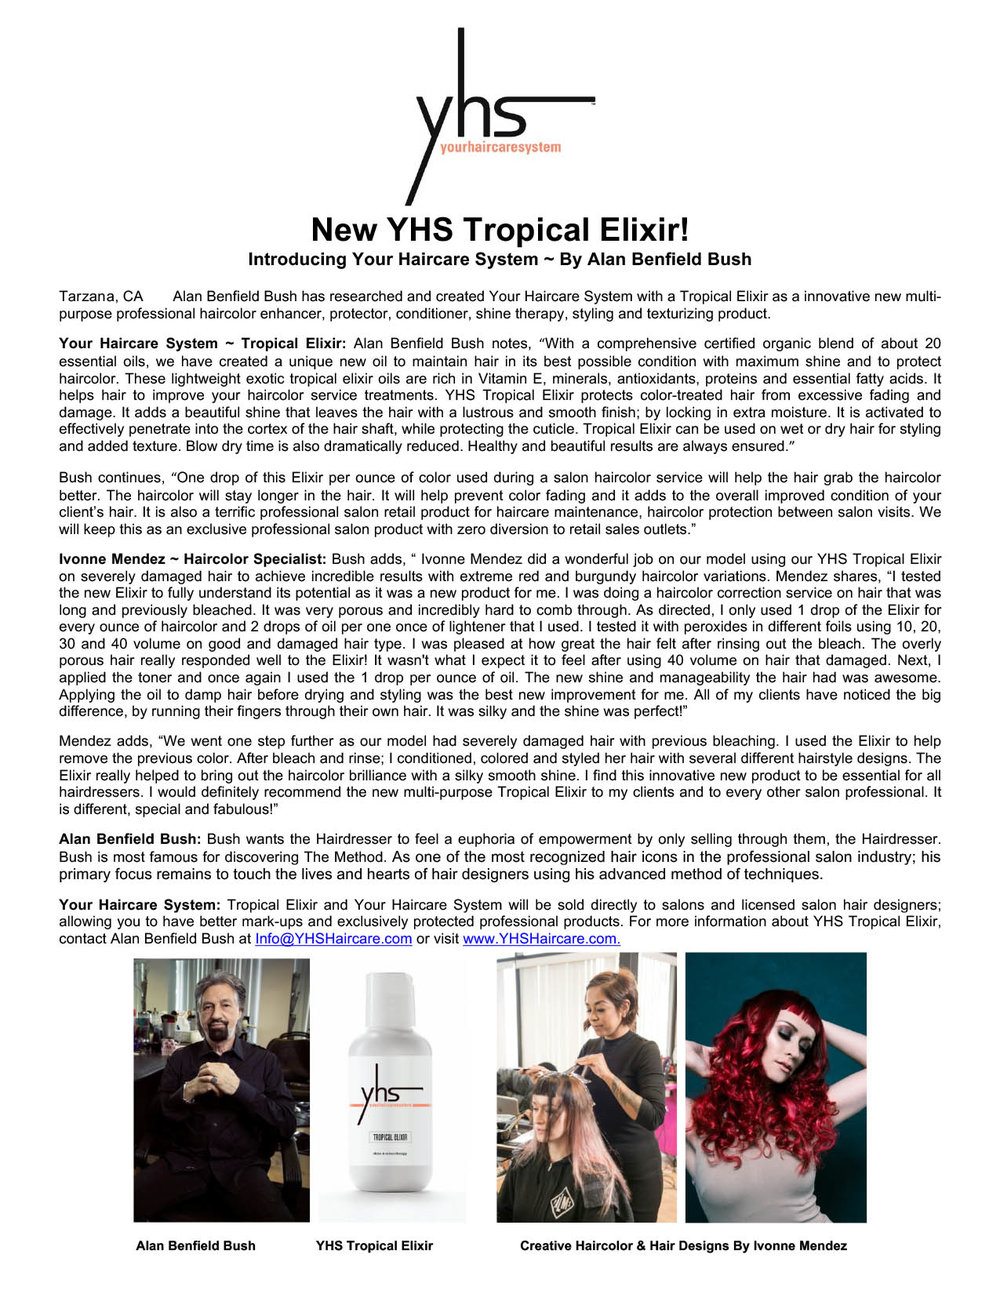 YHS -- PR Your Haircare System -- New Tropical Elixir launch-FNL WEB Mar28,17.jpg